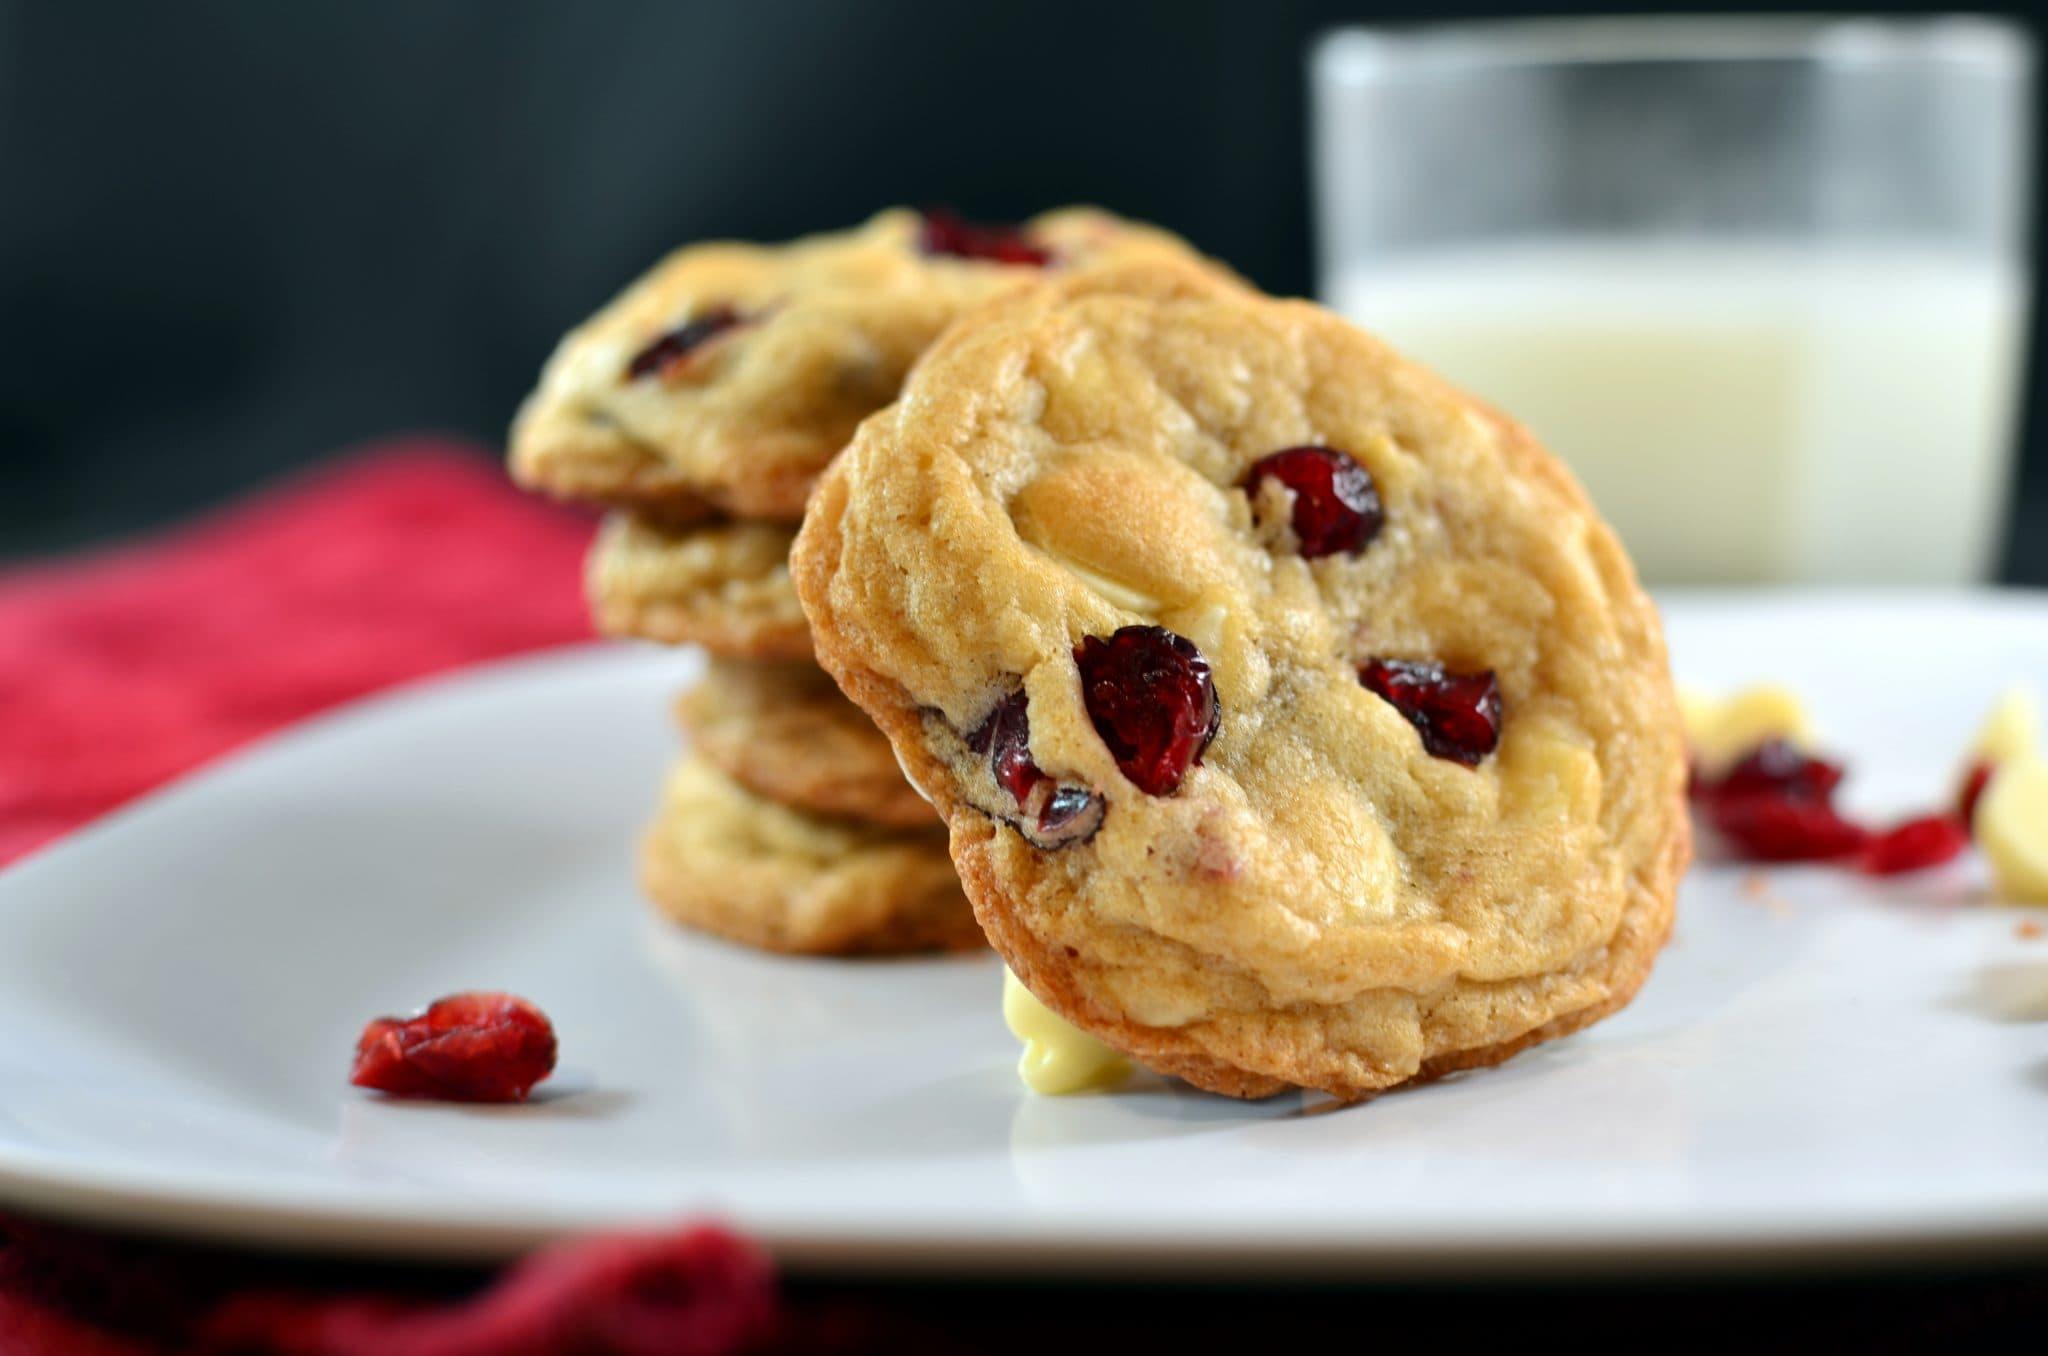 White Chocolate, Macadamia Nut, and Cranberry Cookies